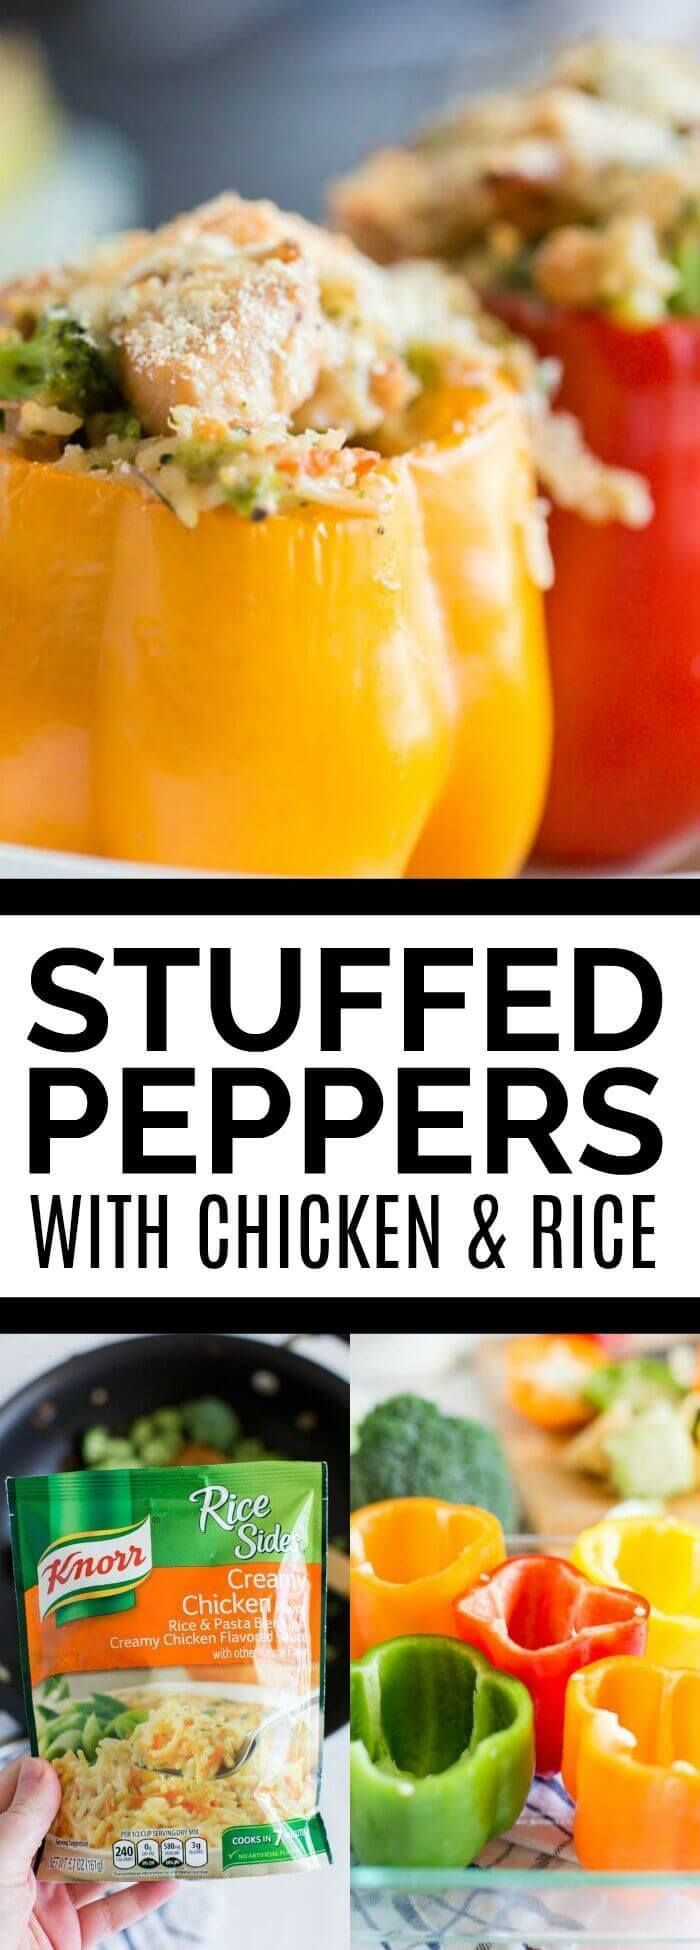 Easy Stuffed Peppers Recipe via @spaceshipslb #EatBetterLiveBetter #Walmart #ad